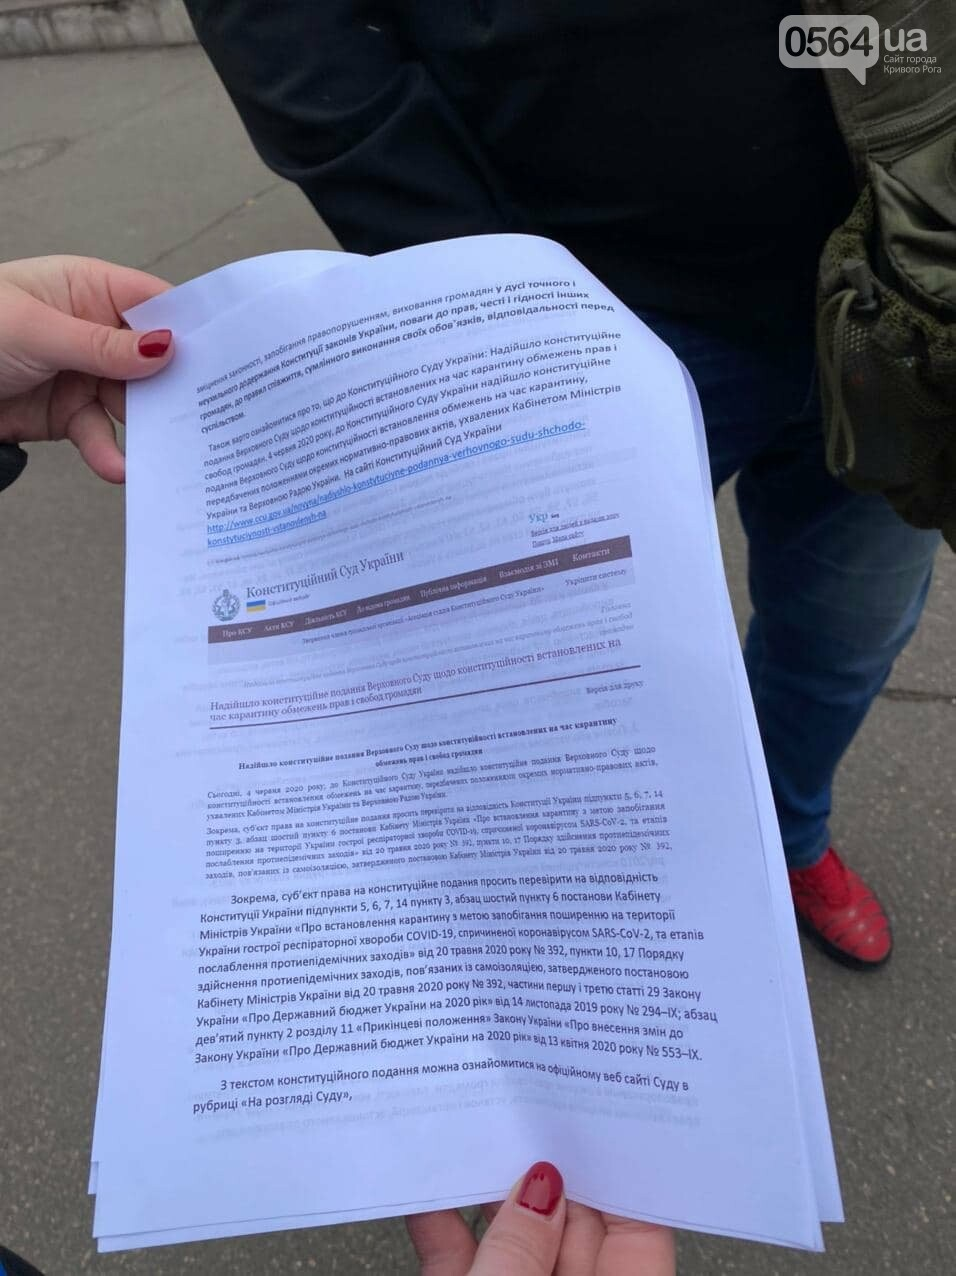 Представители малого бизнеса продолжили протест возле мэрии Кривого Рога, - ФОТО, ВИДЕО, фото-2